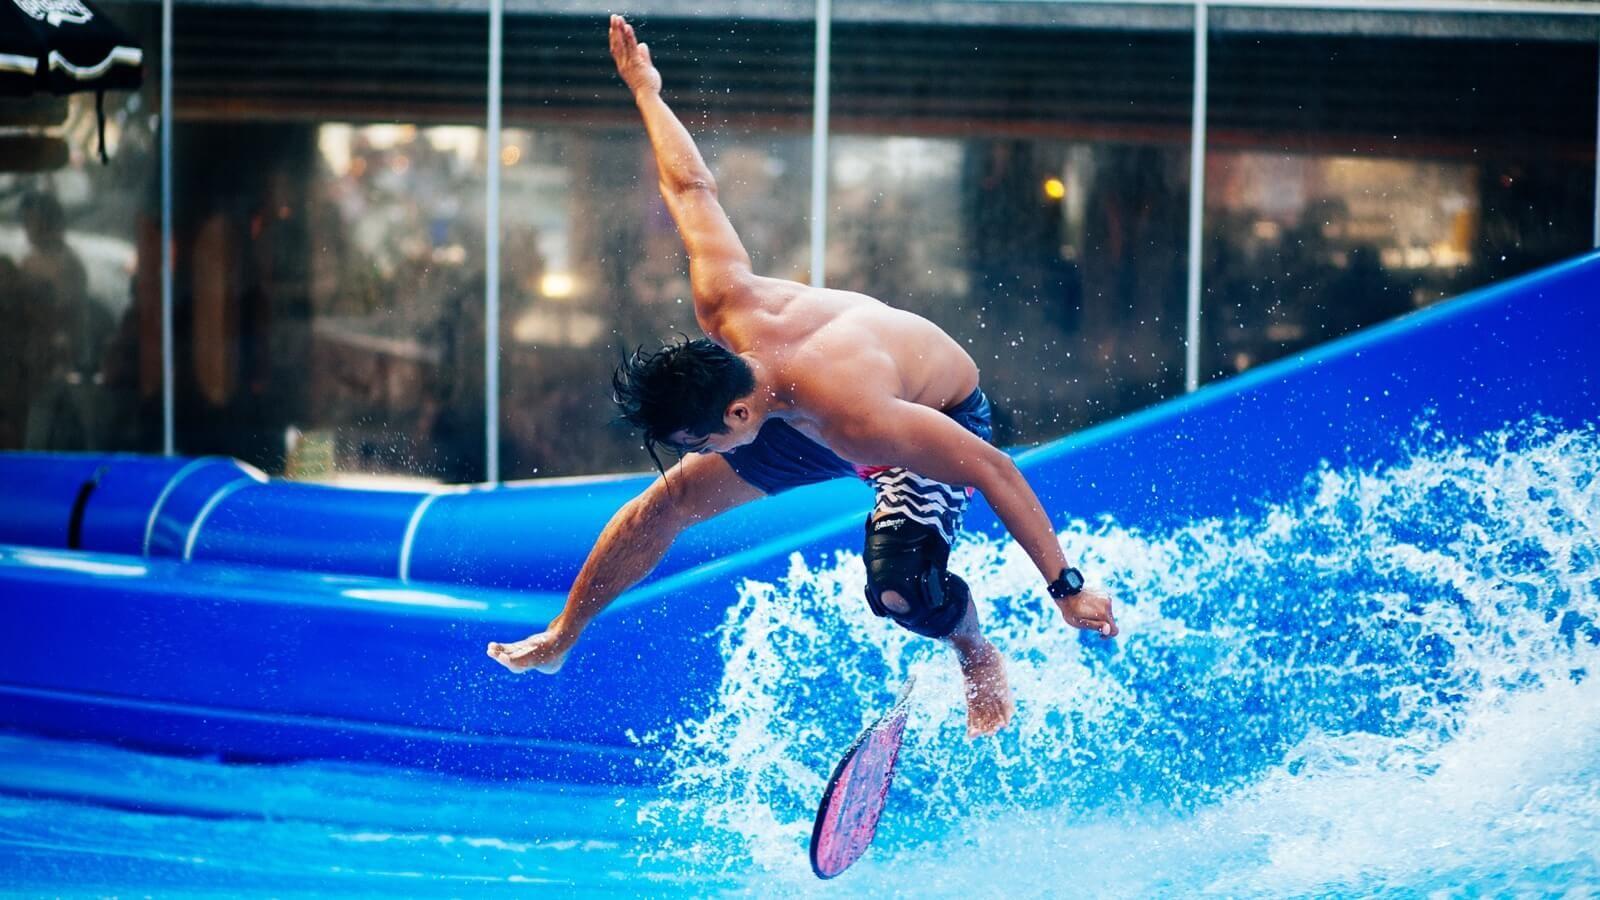 Surfing Surf House Helsinki